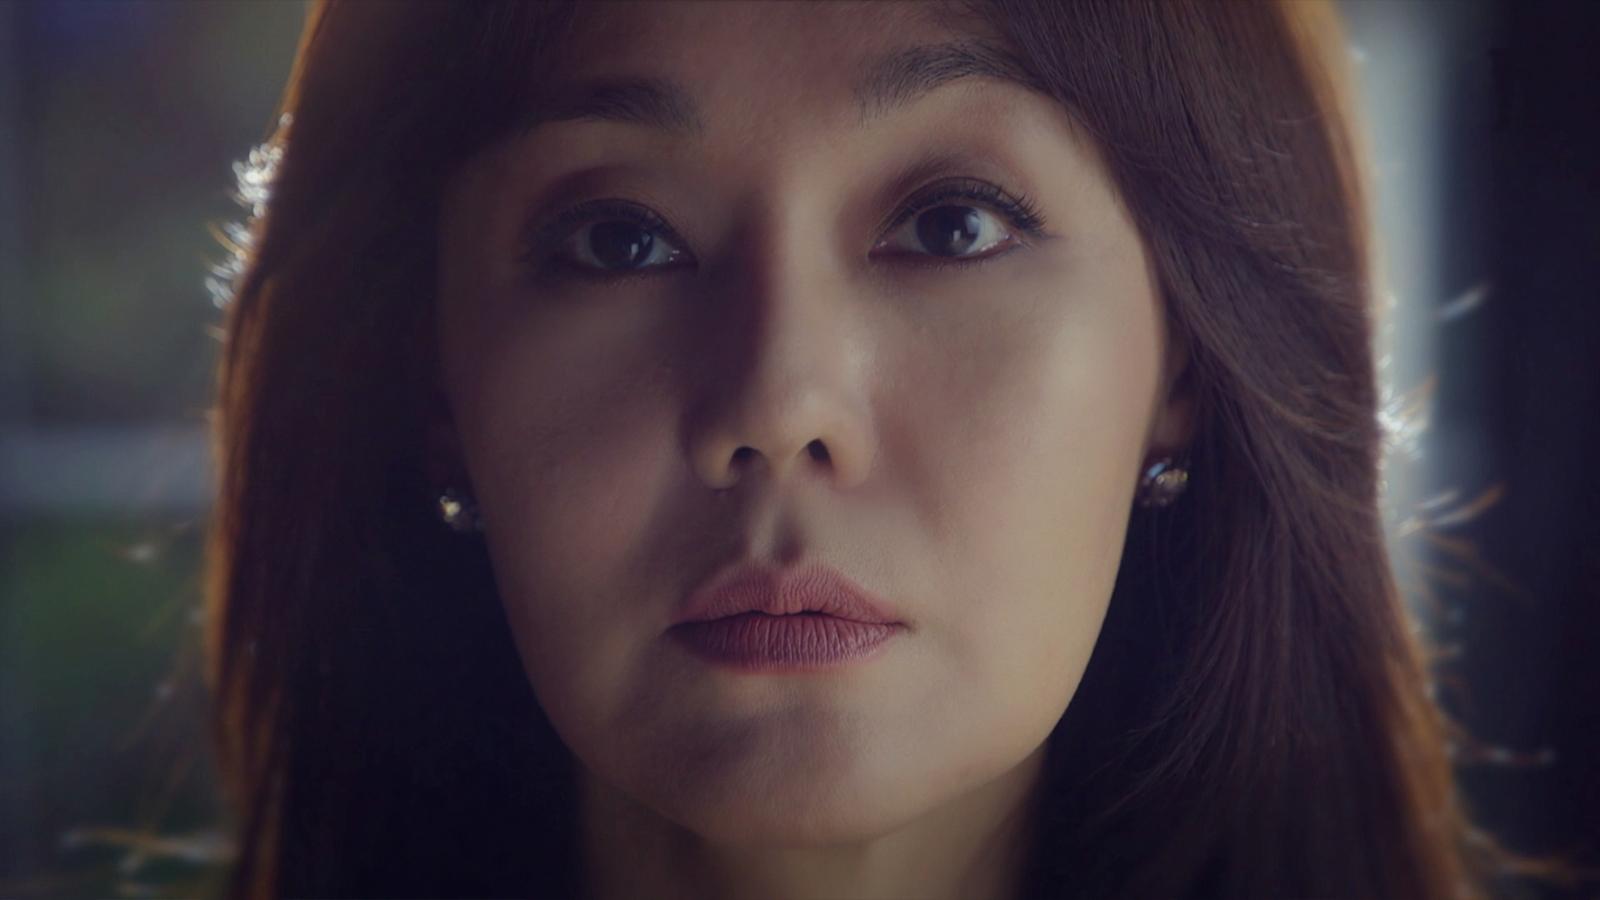 Trailer 1: Ms Ma, Nemesis